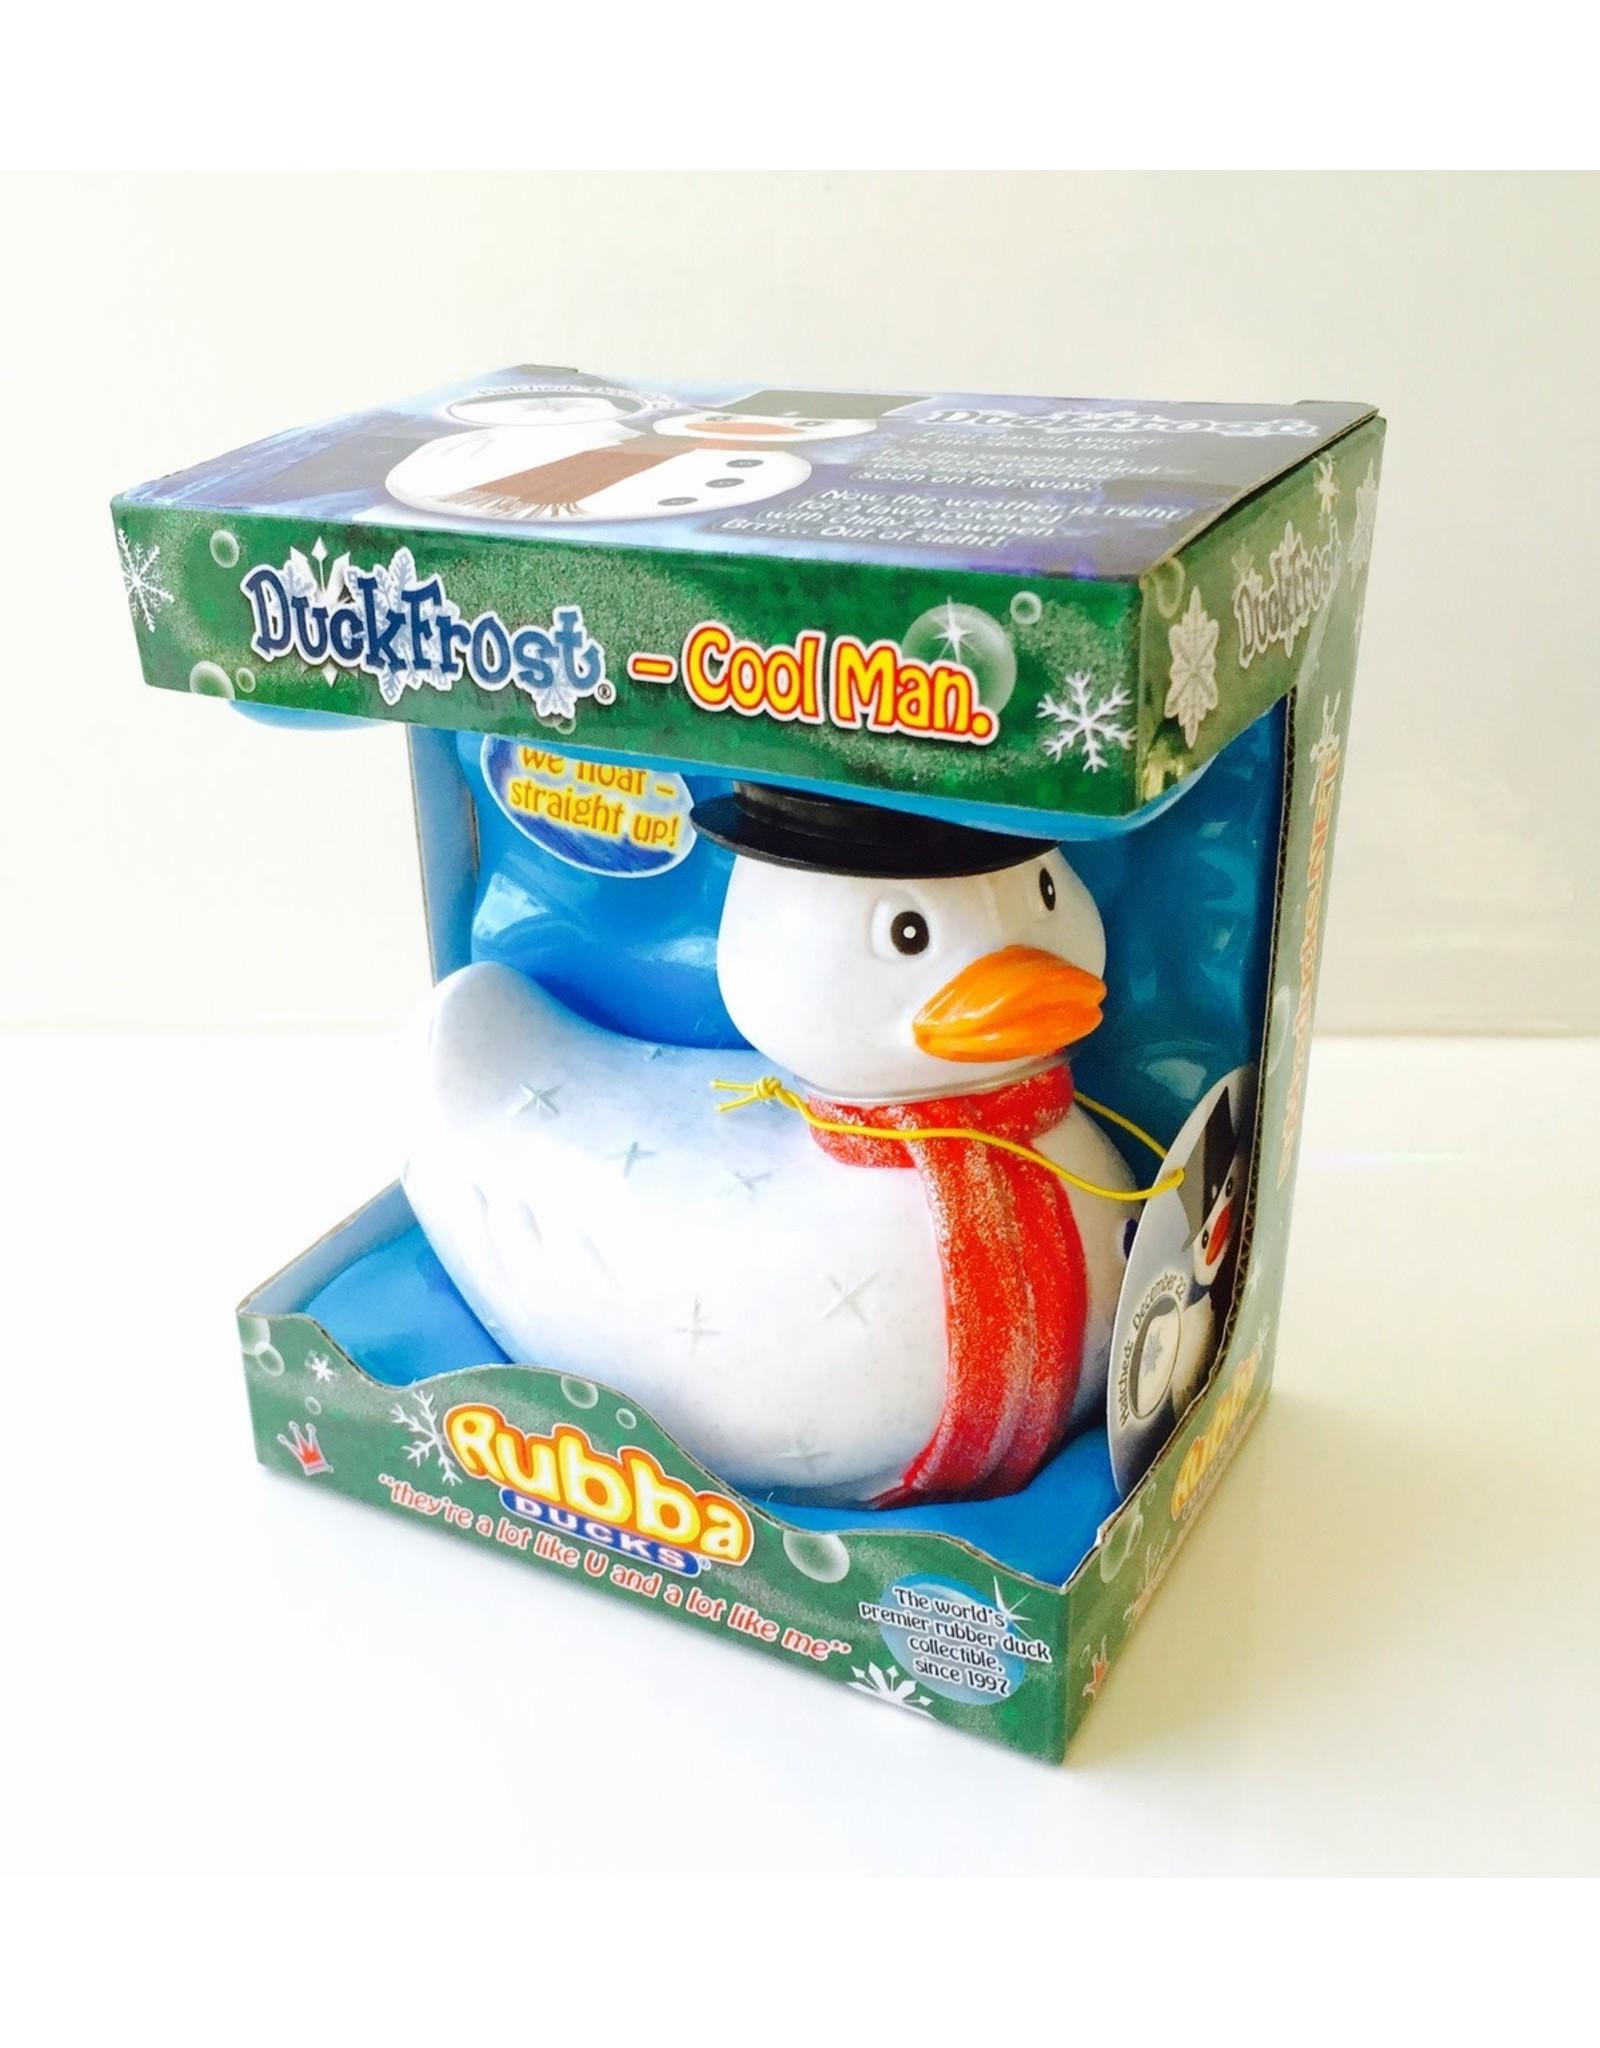 Duckfrost the Snowman Rubber Duck